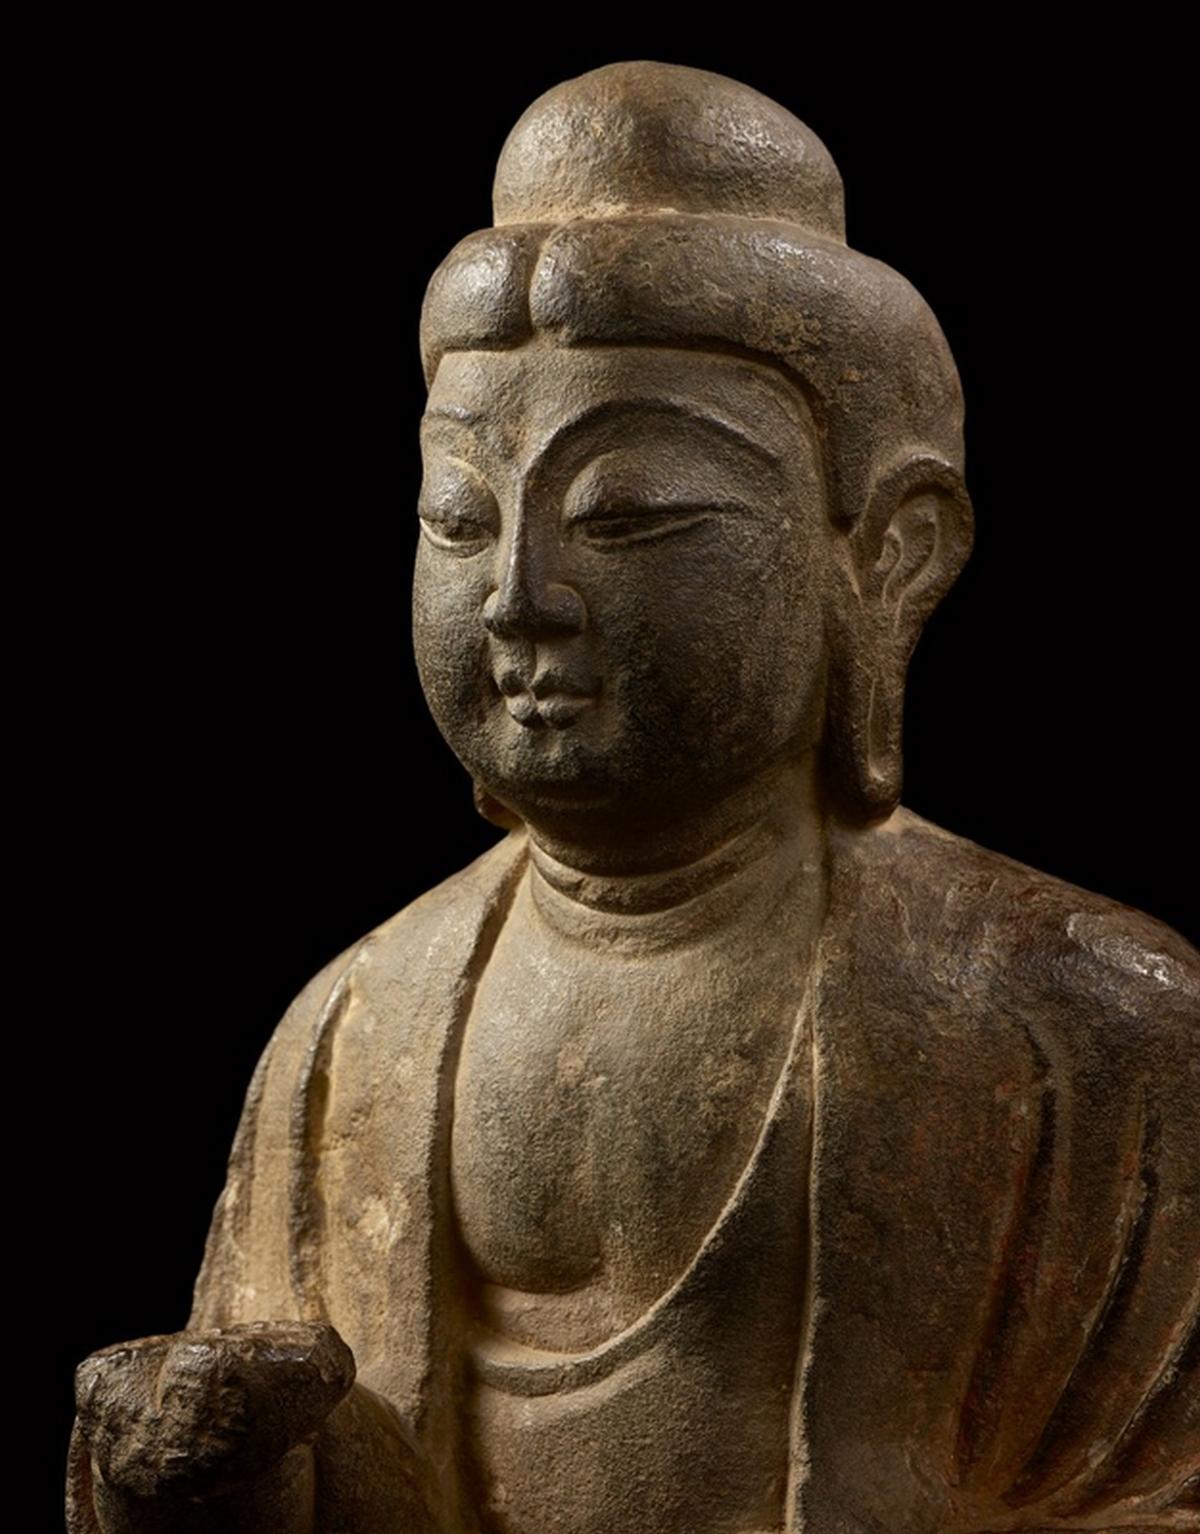 La contemplation dans les textes taoïstes